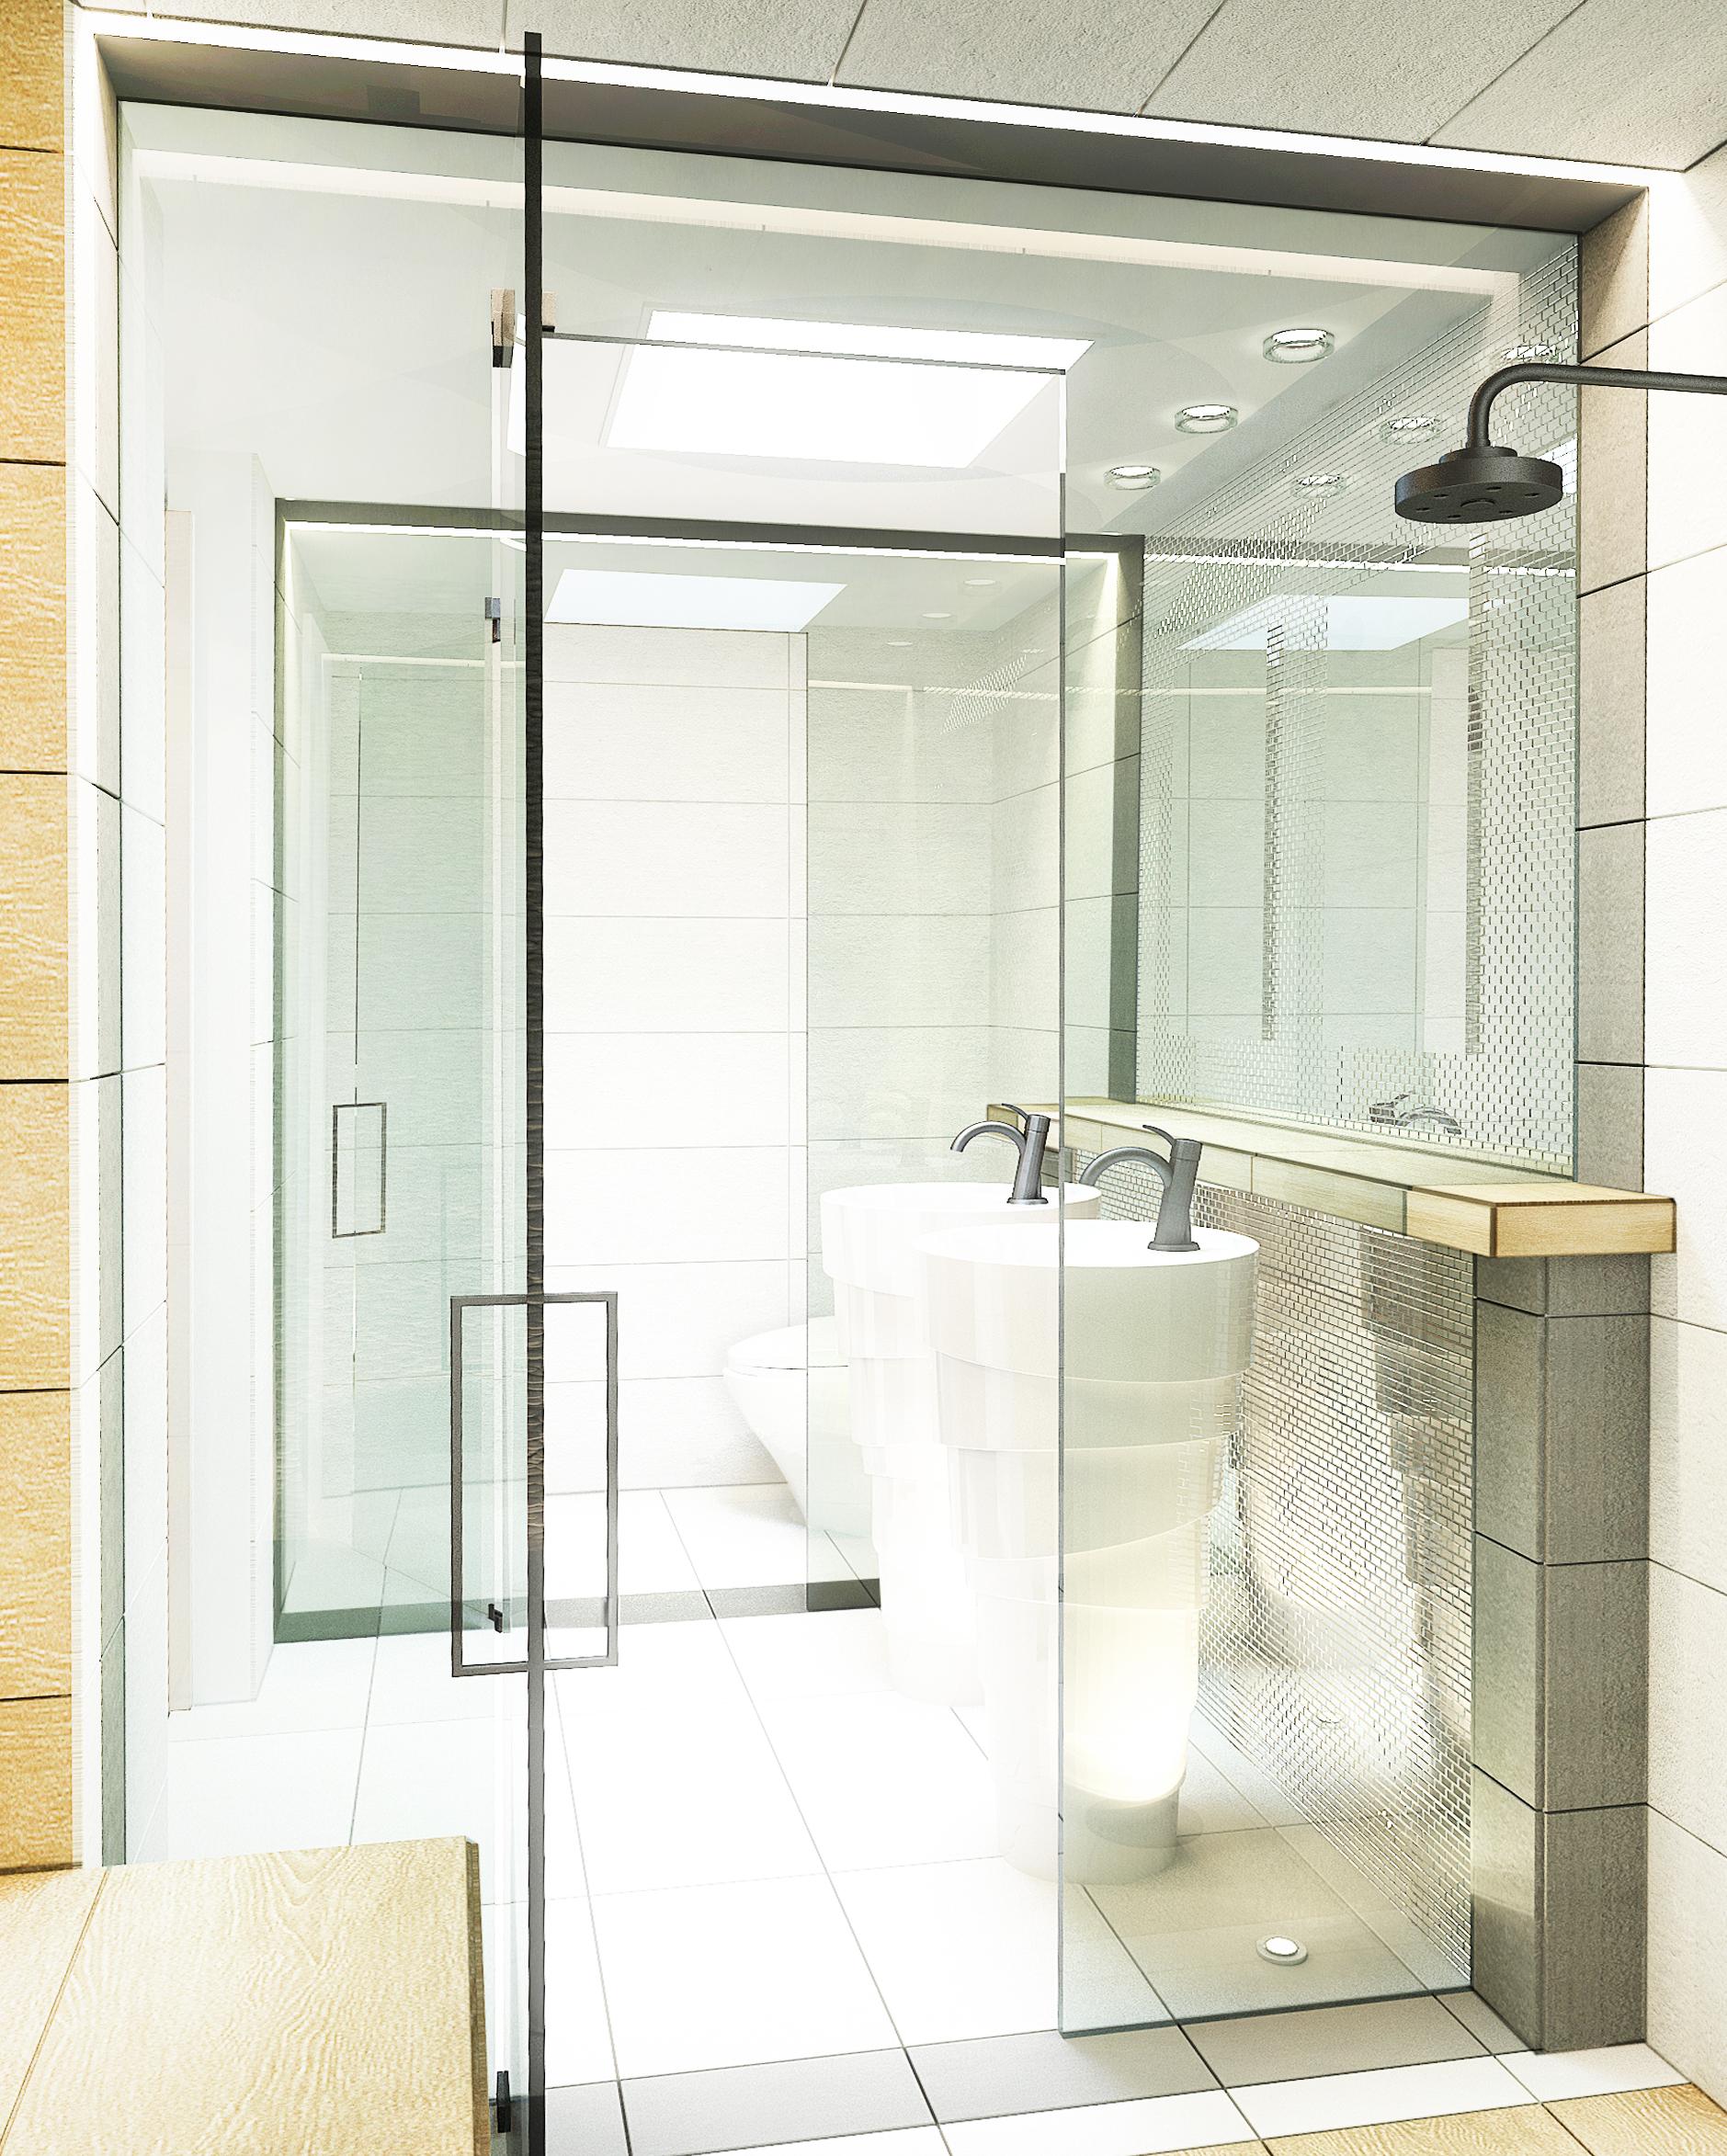 229Westbroadway_bathroom_scene2 (2).jpg